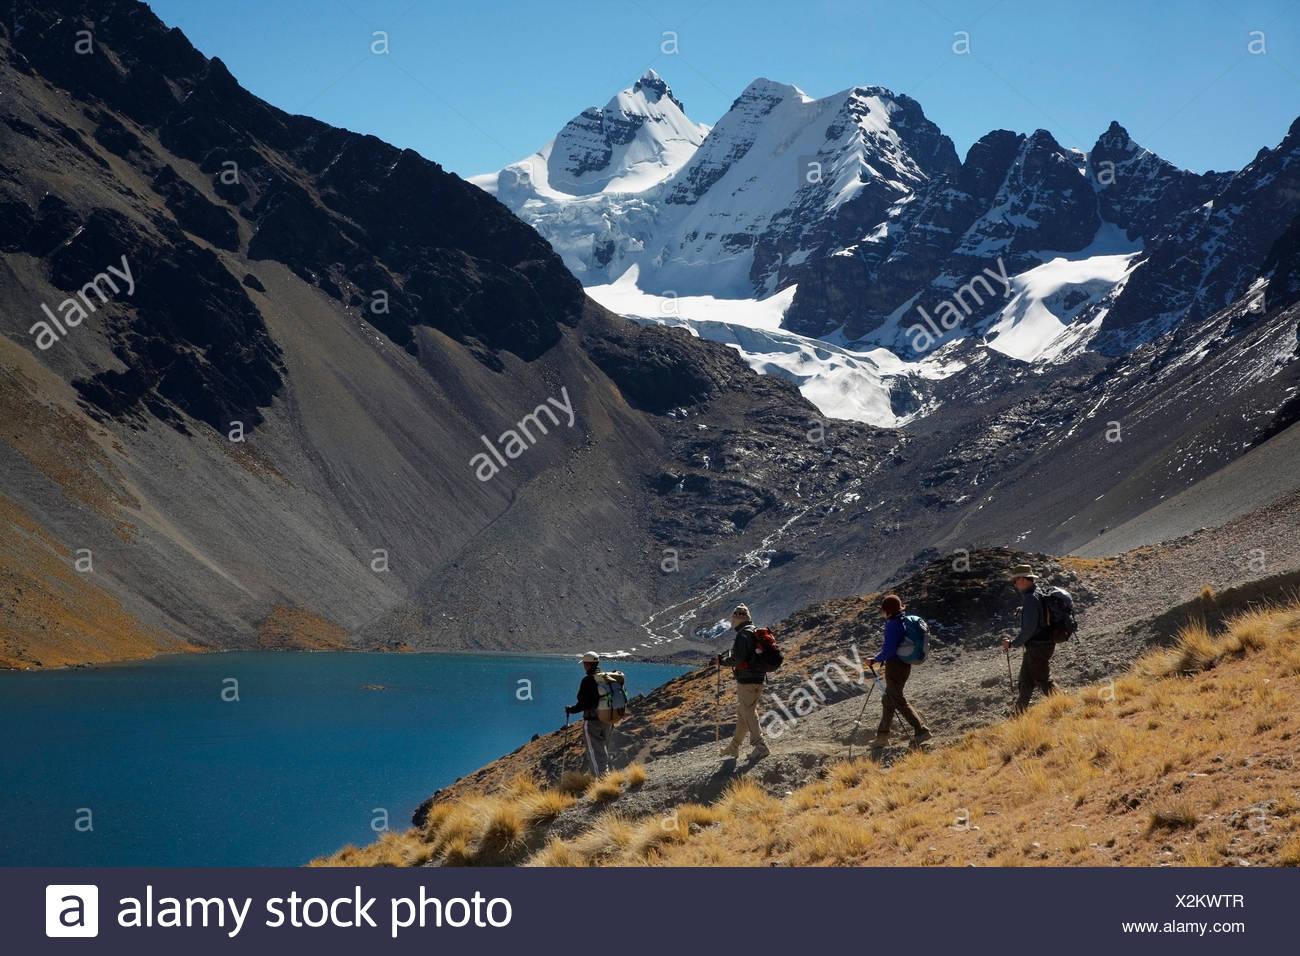 Trekkers With Condorri Peak Behind - Stock Image